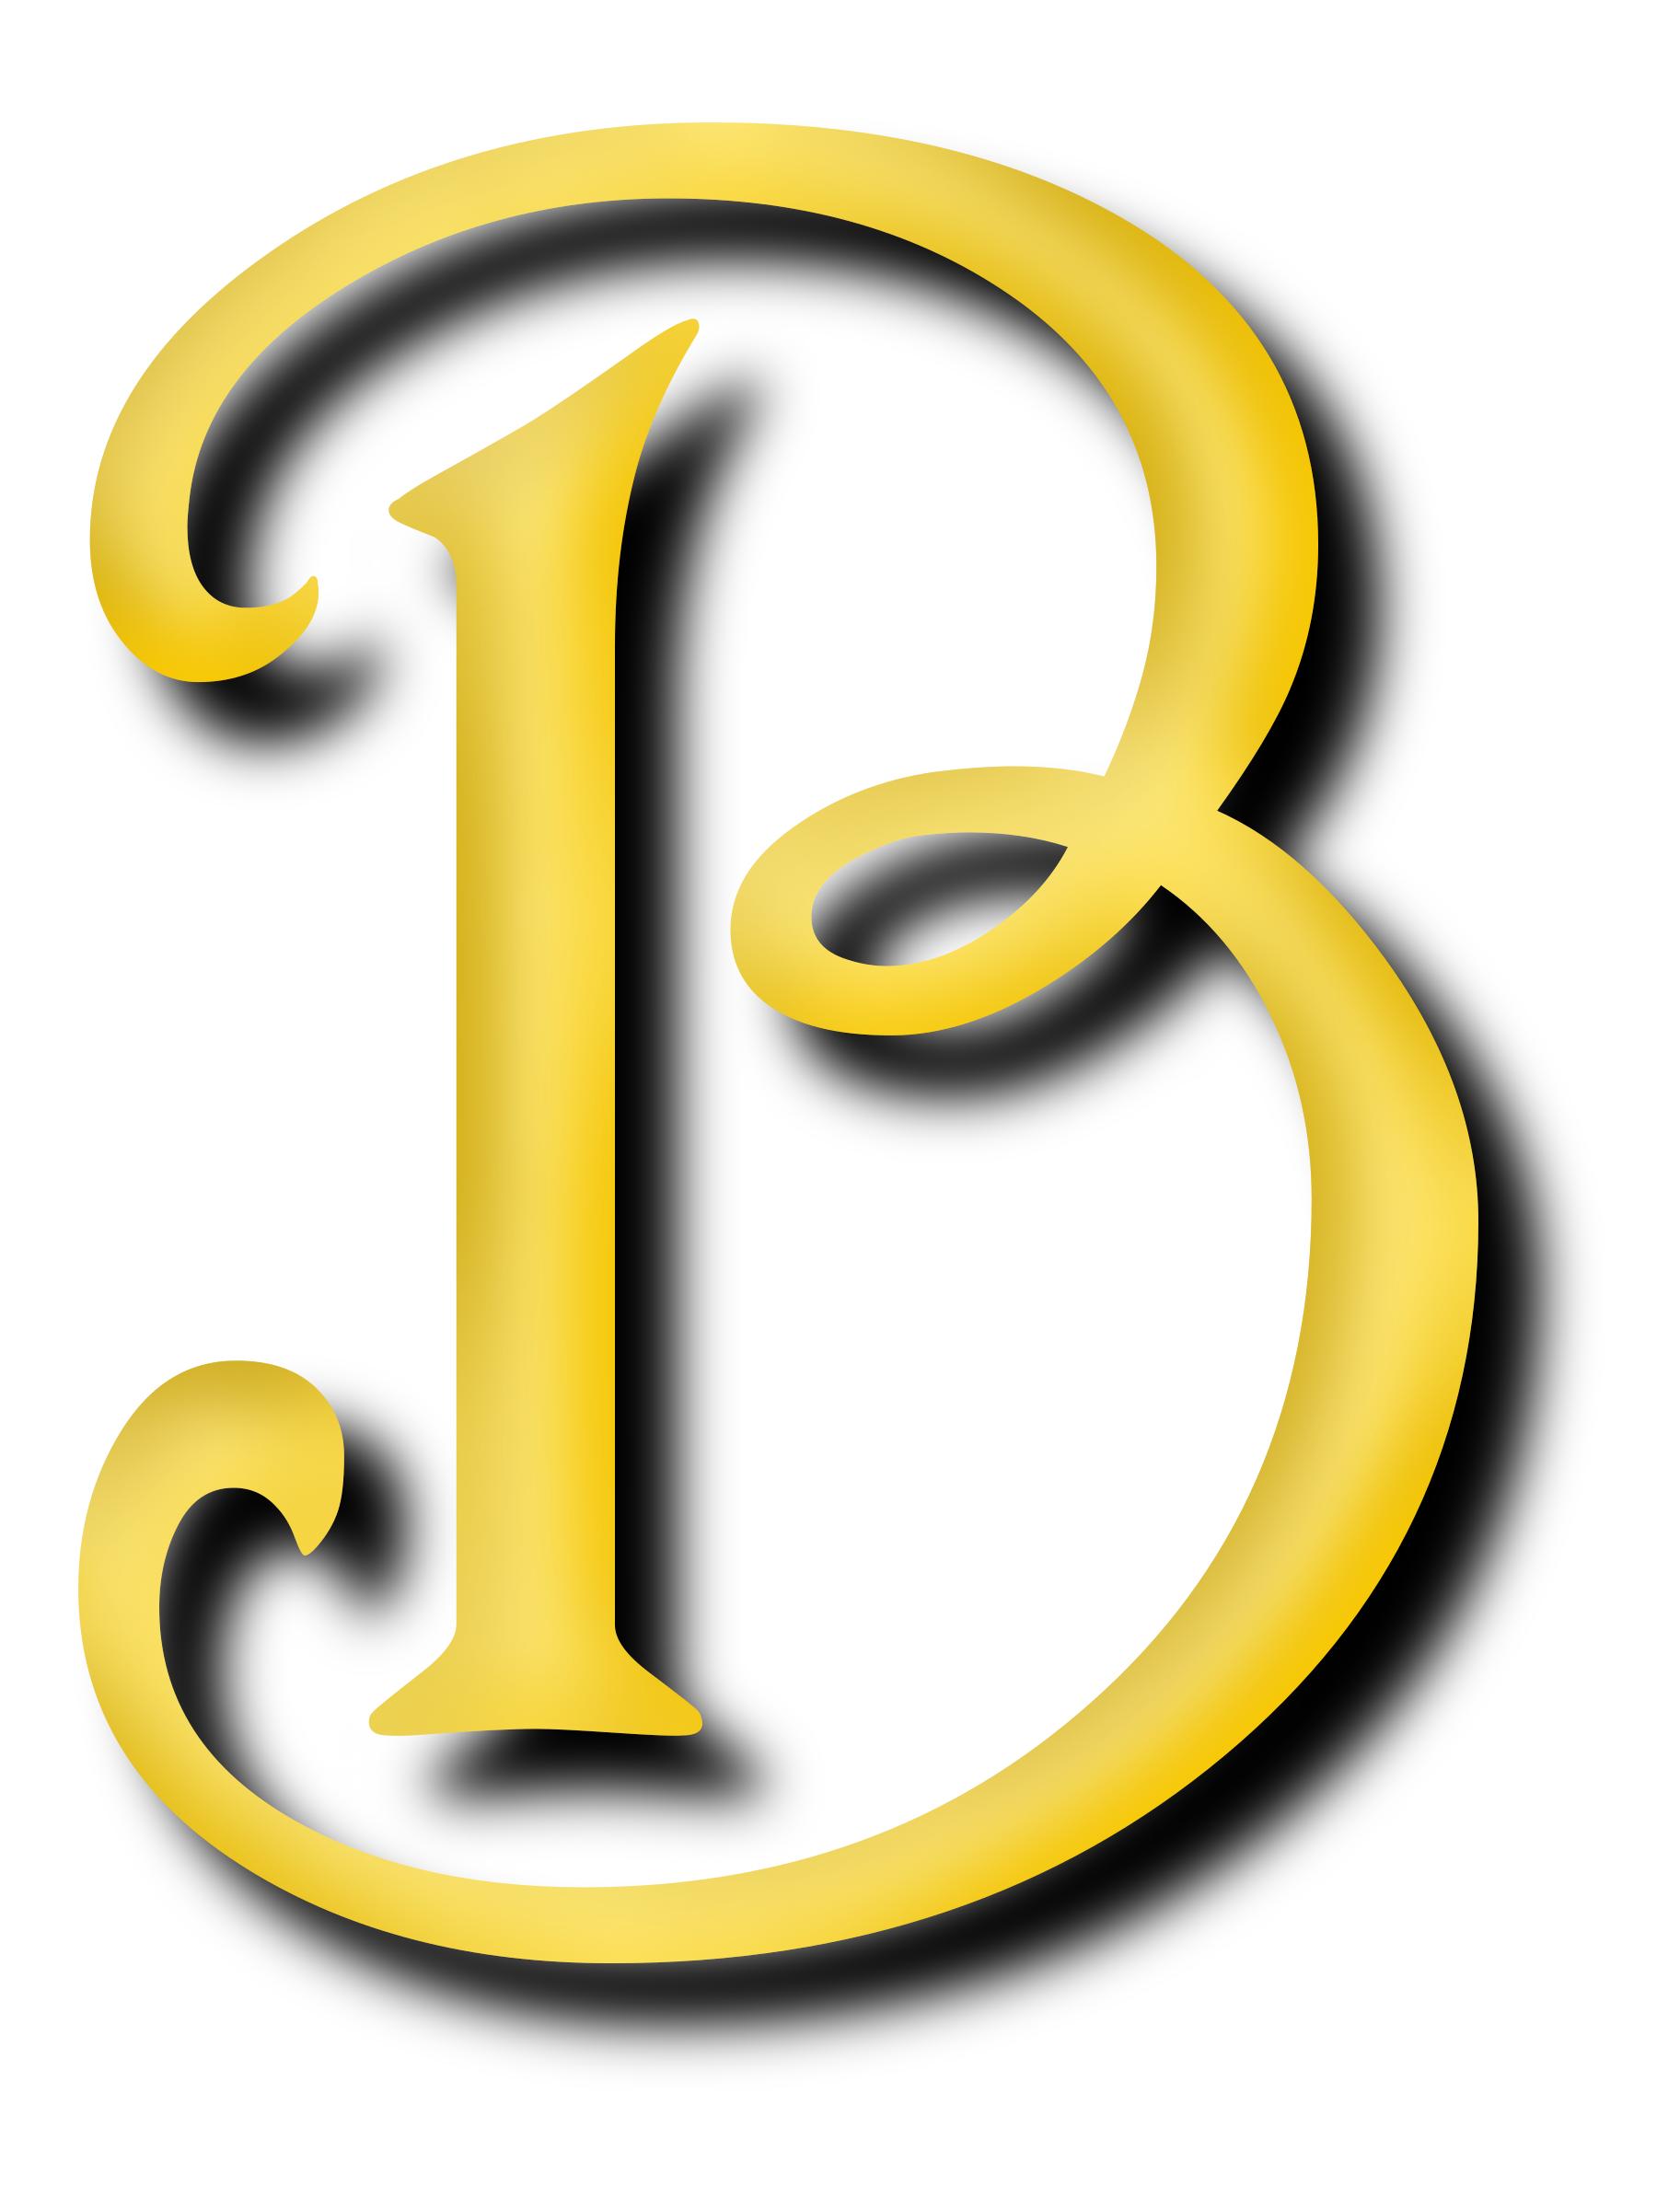 Alphabet letter big image. B clipart yellow